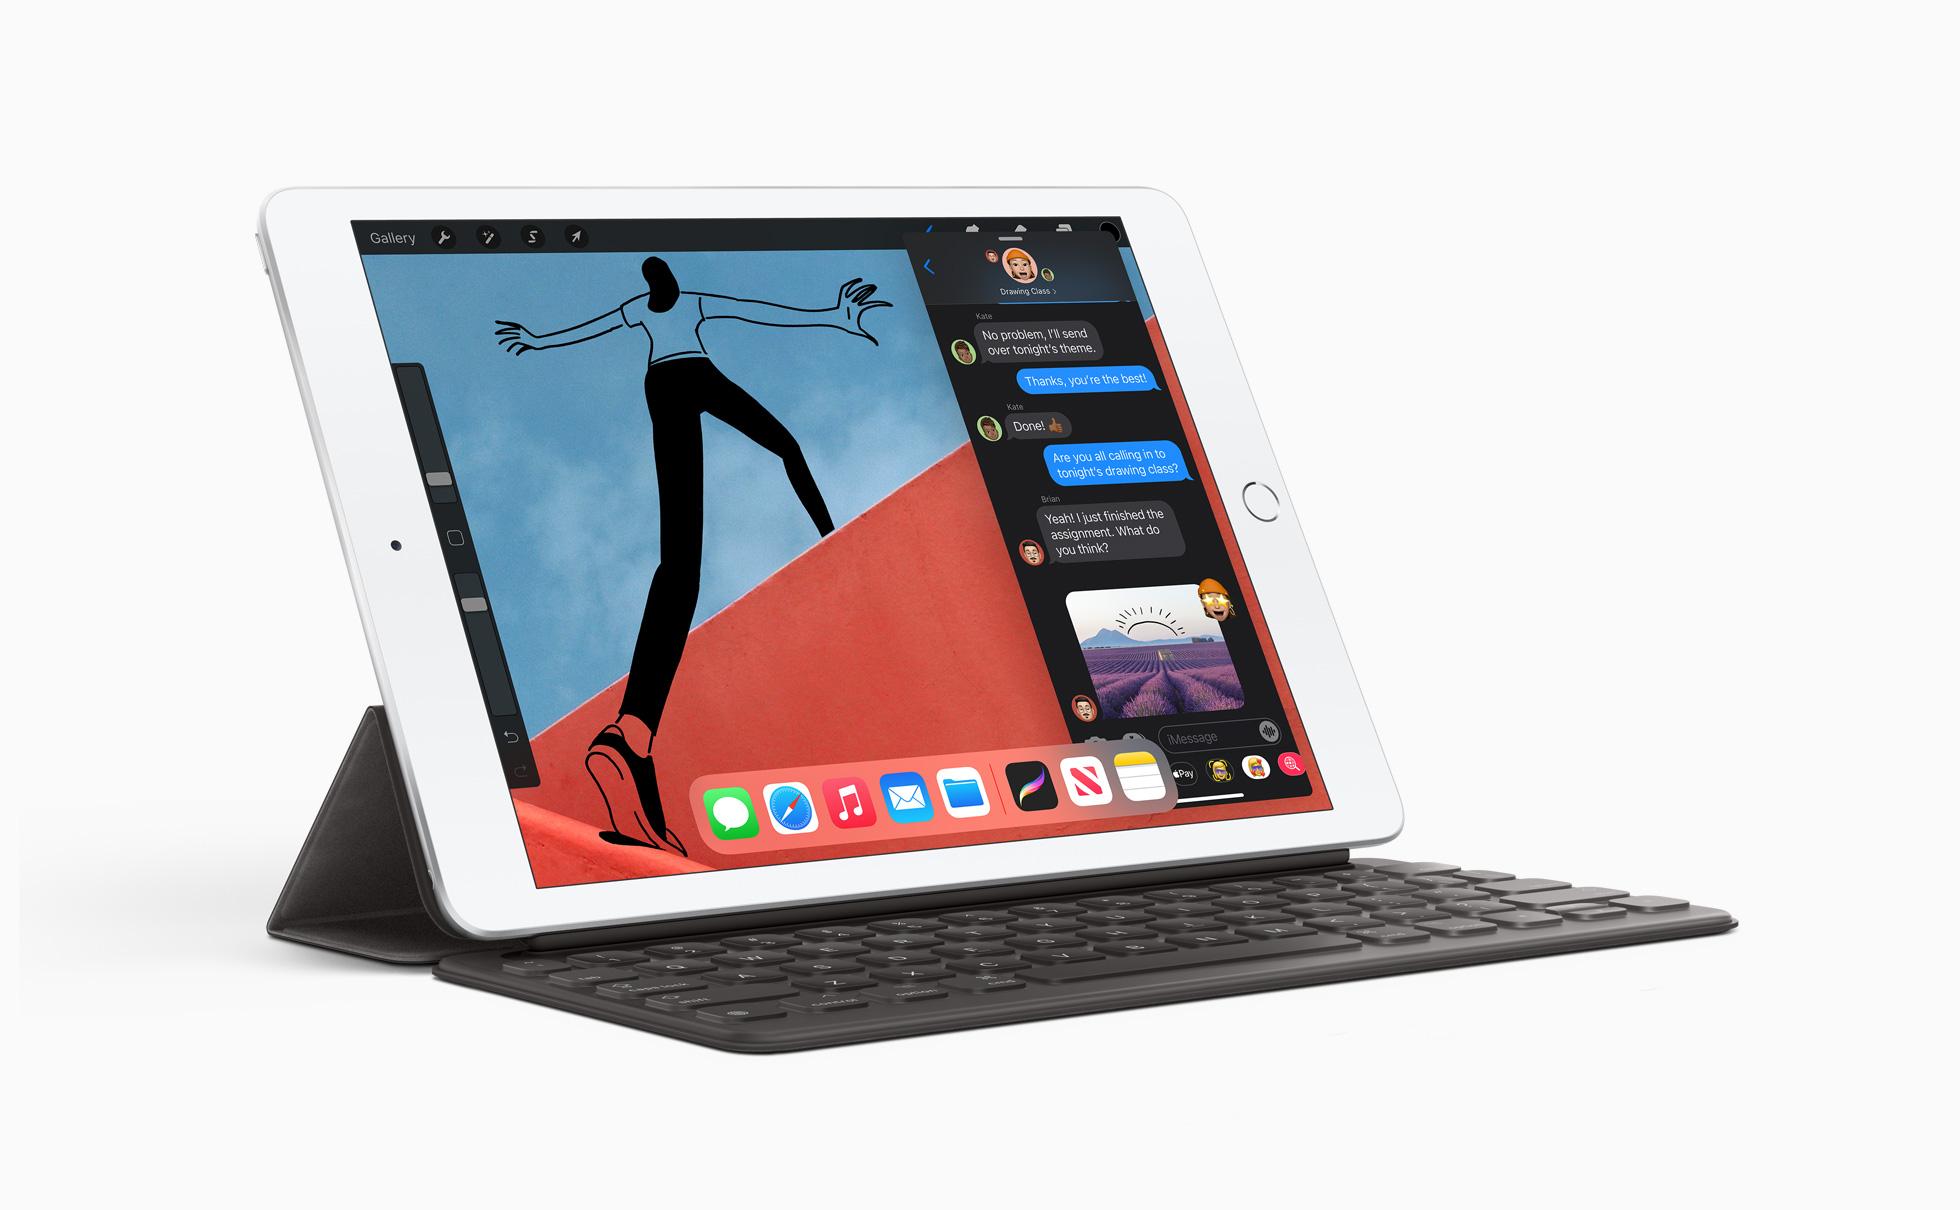 apple ipad-8th-gen w-keyboard 09152020 big.jpg.large 2x